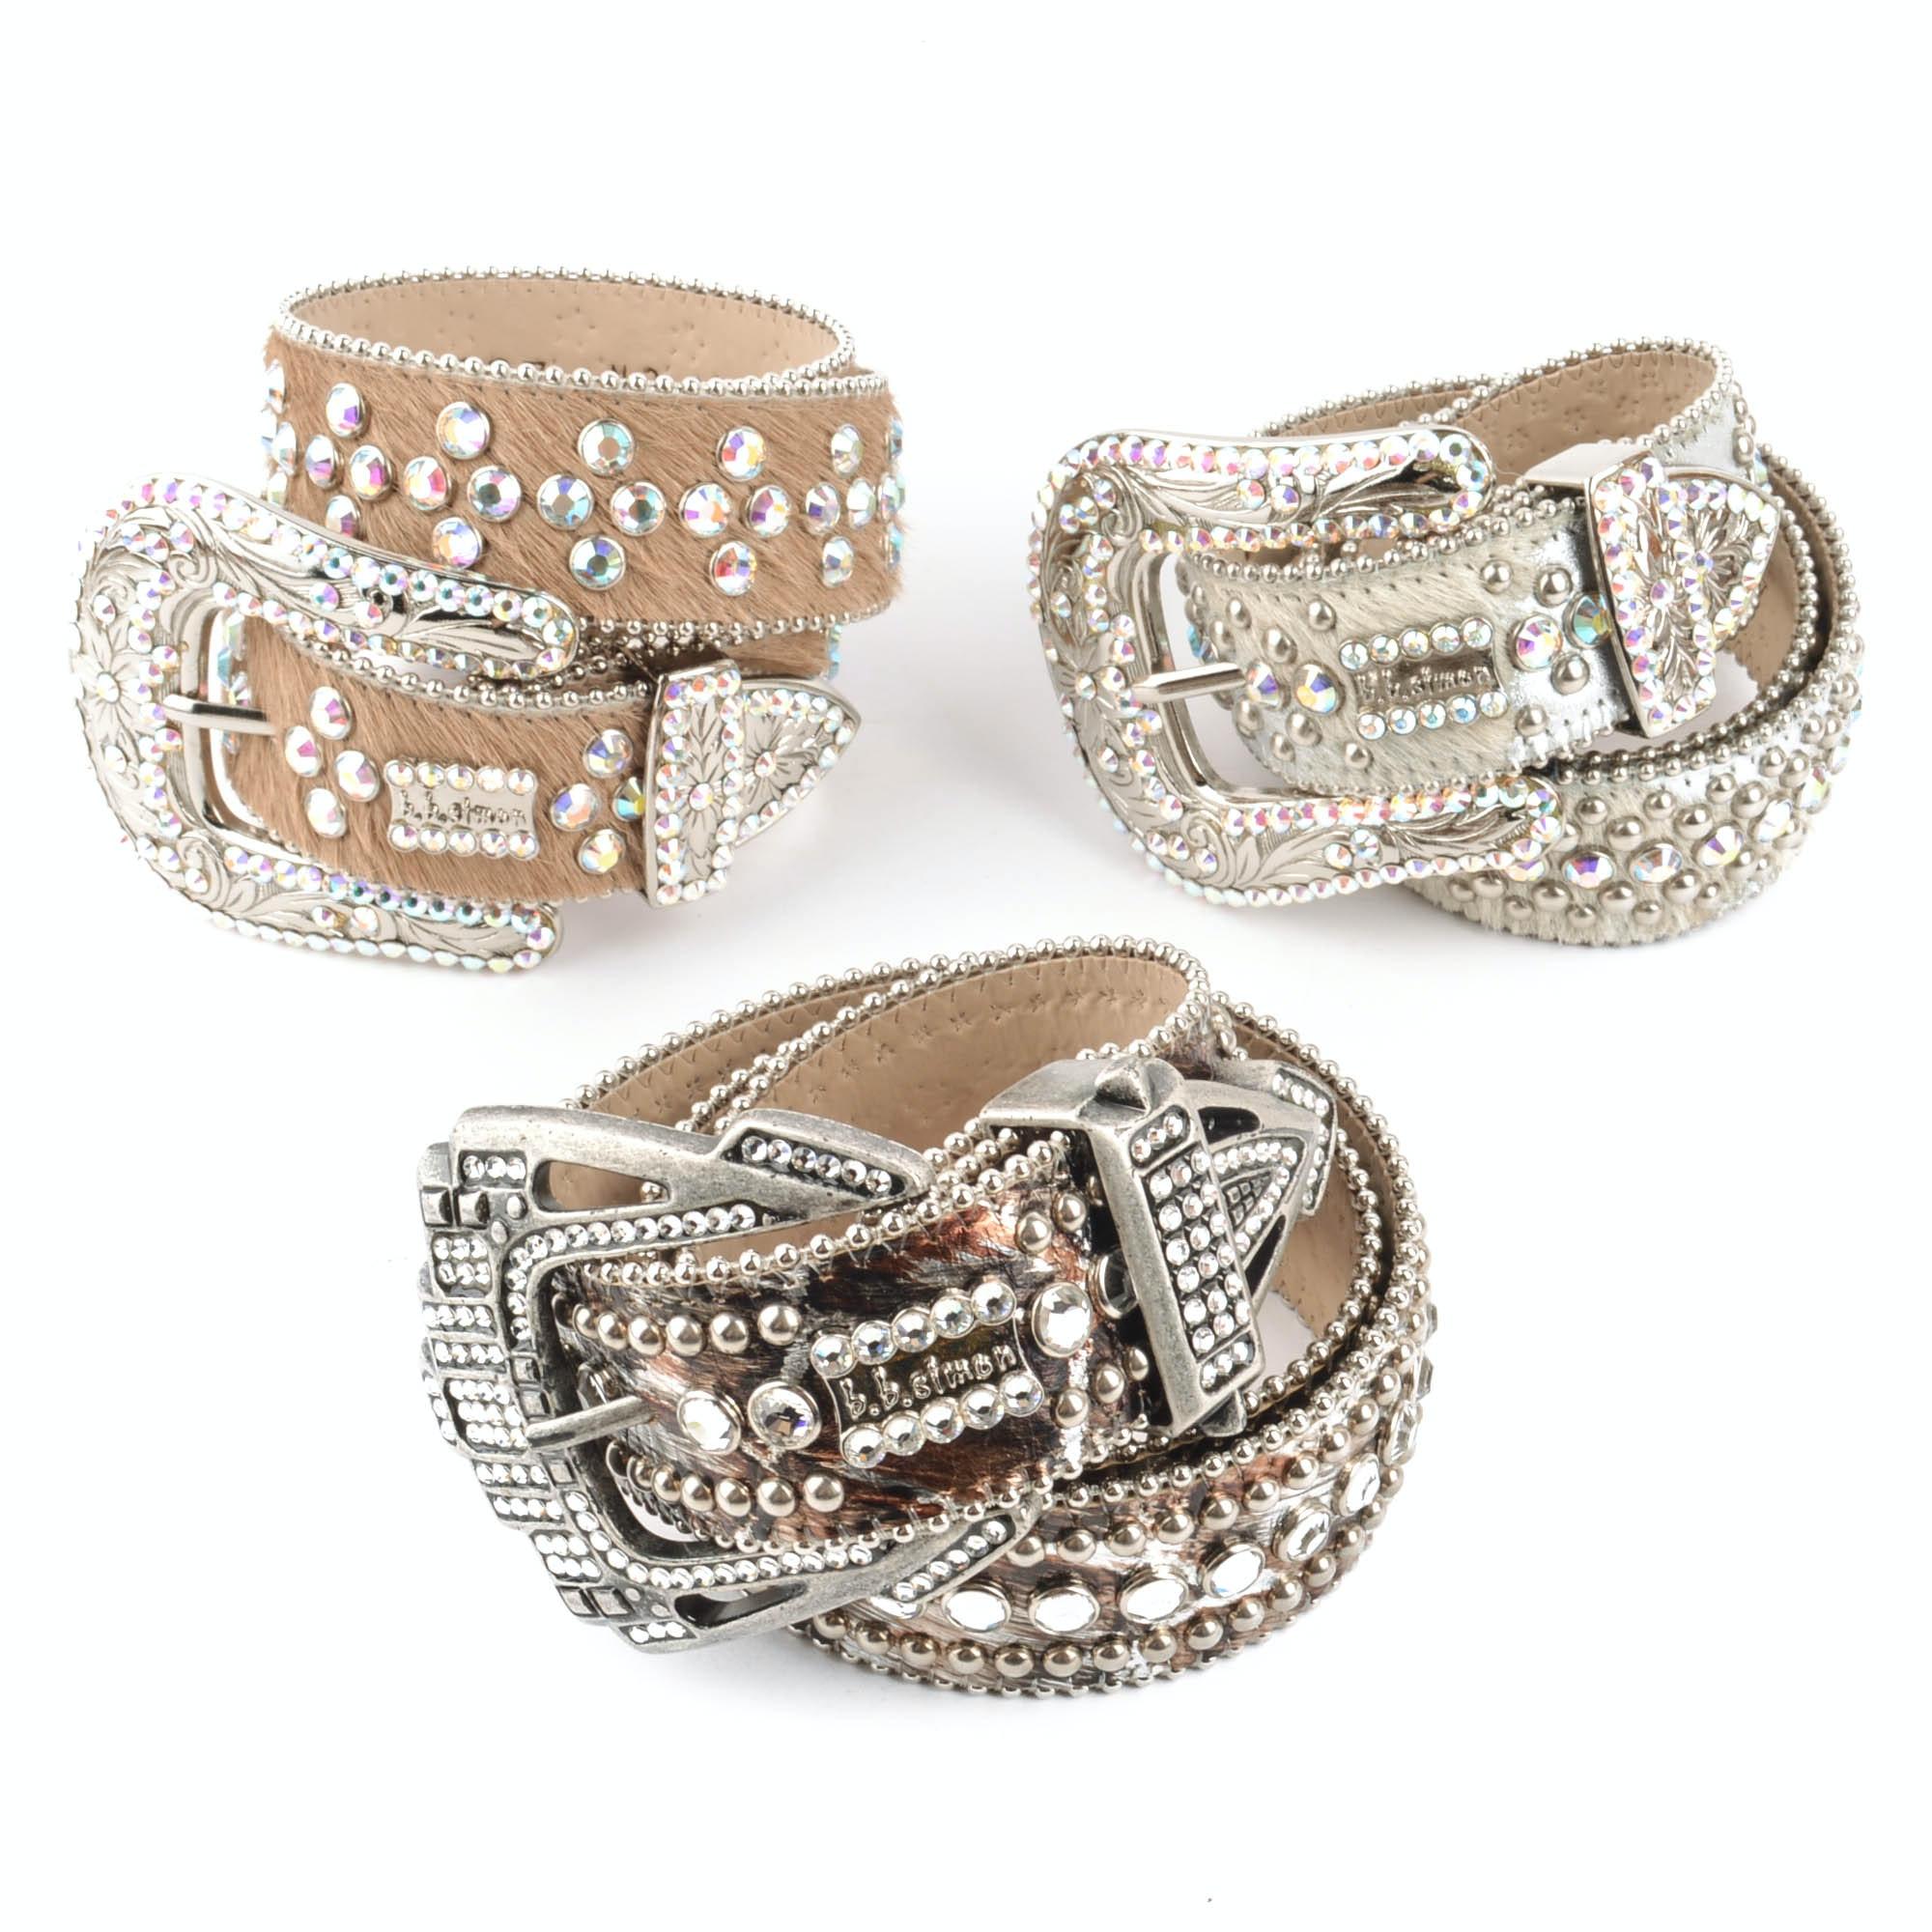 Three B.B. Simon Women's Belts with Swarovski Crystals